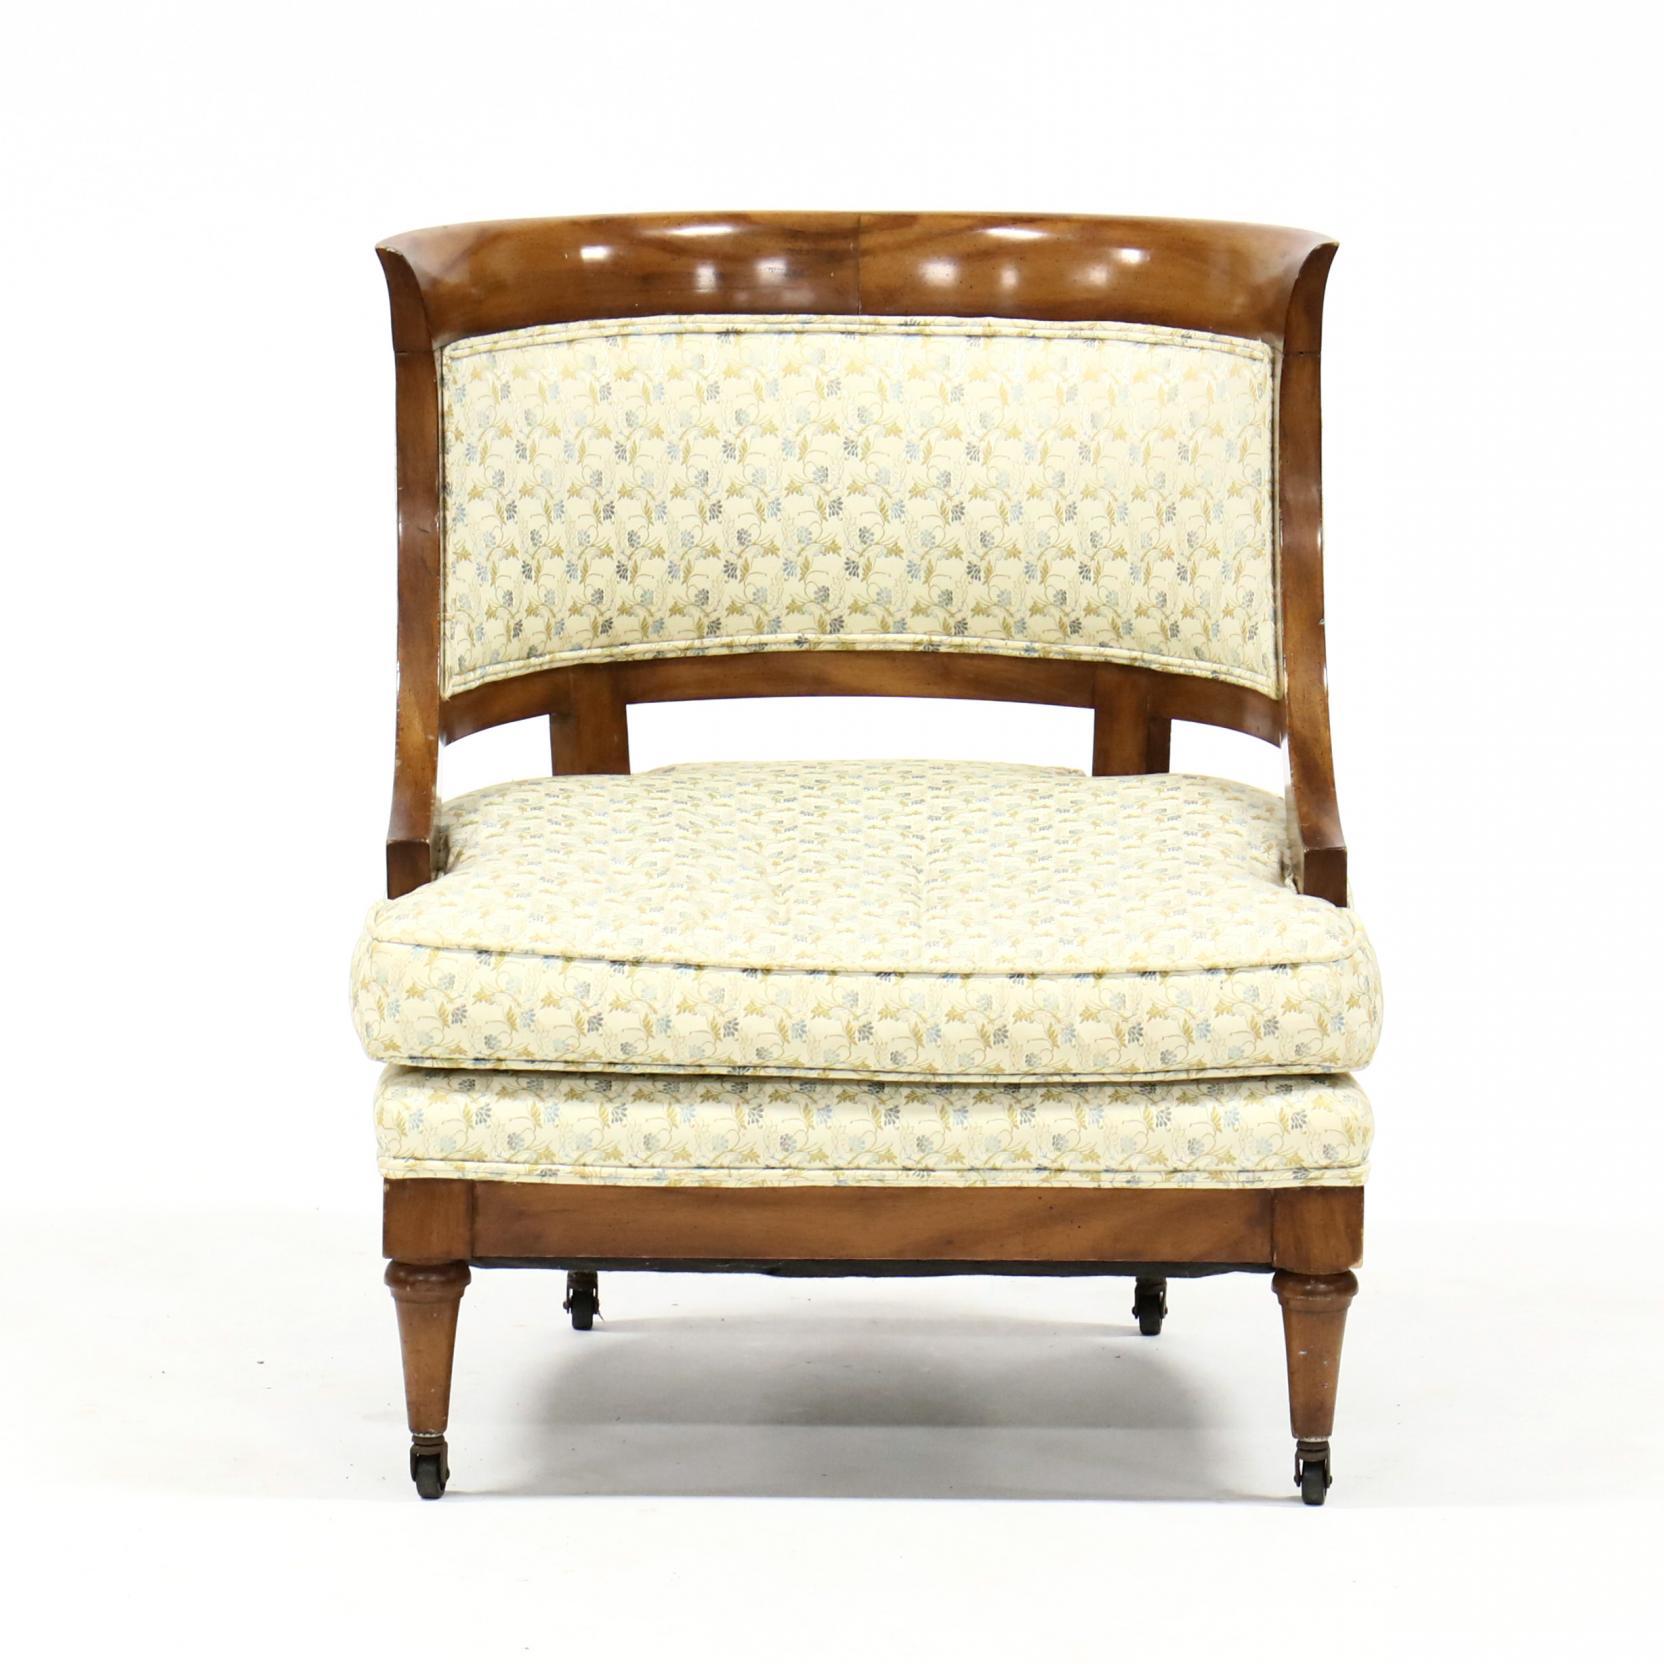 regency-style-slipper-chair